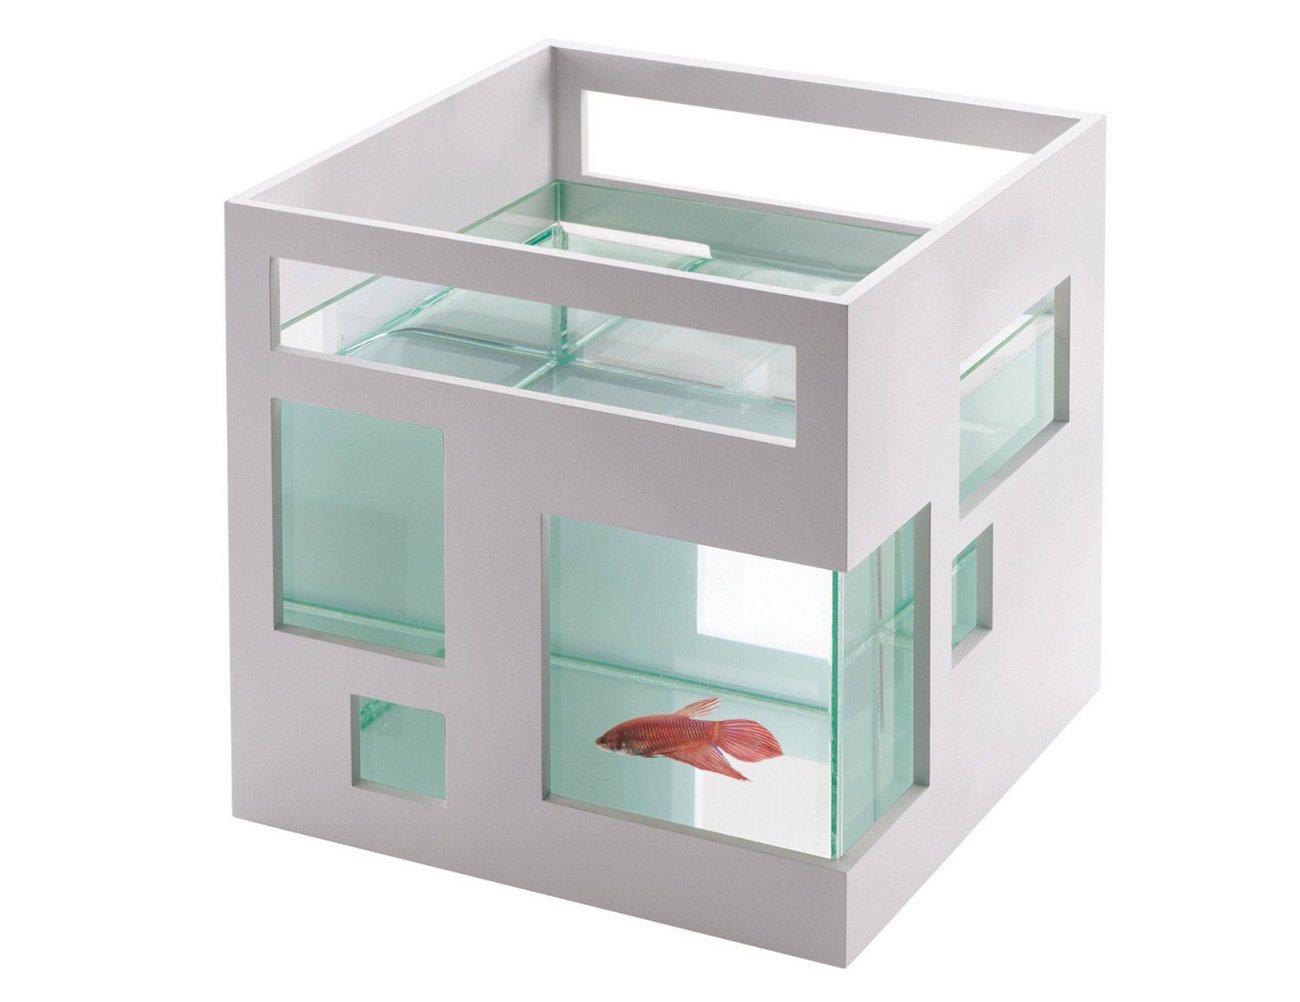 Modular Fish Hotel – Great Looking Fish Condominium